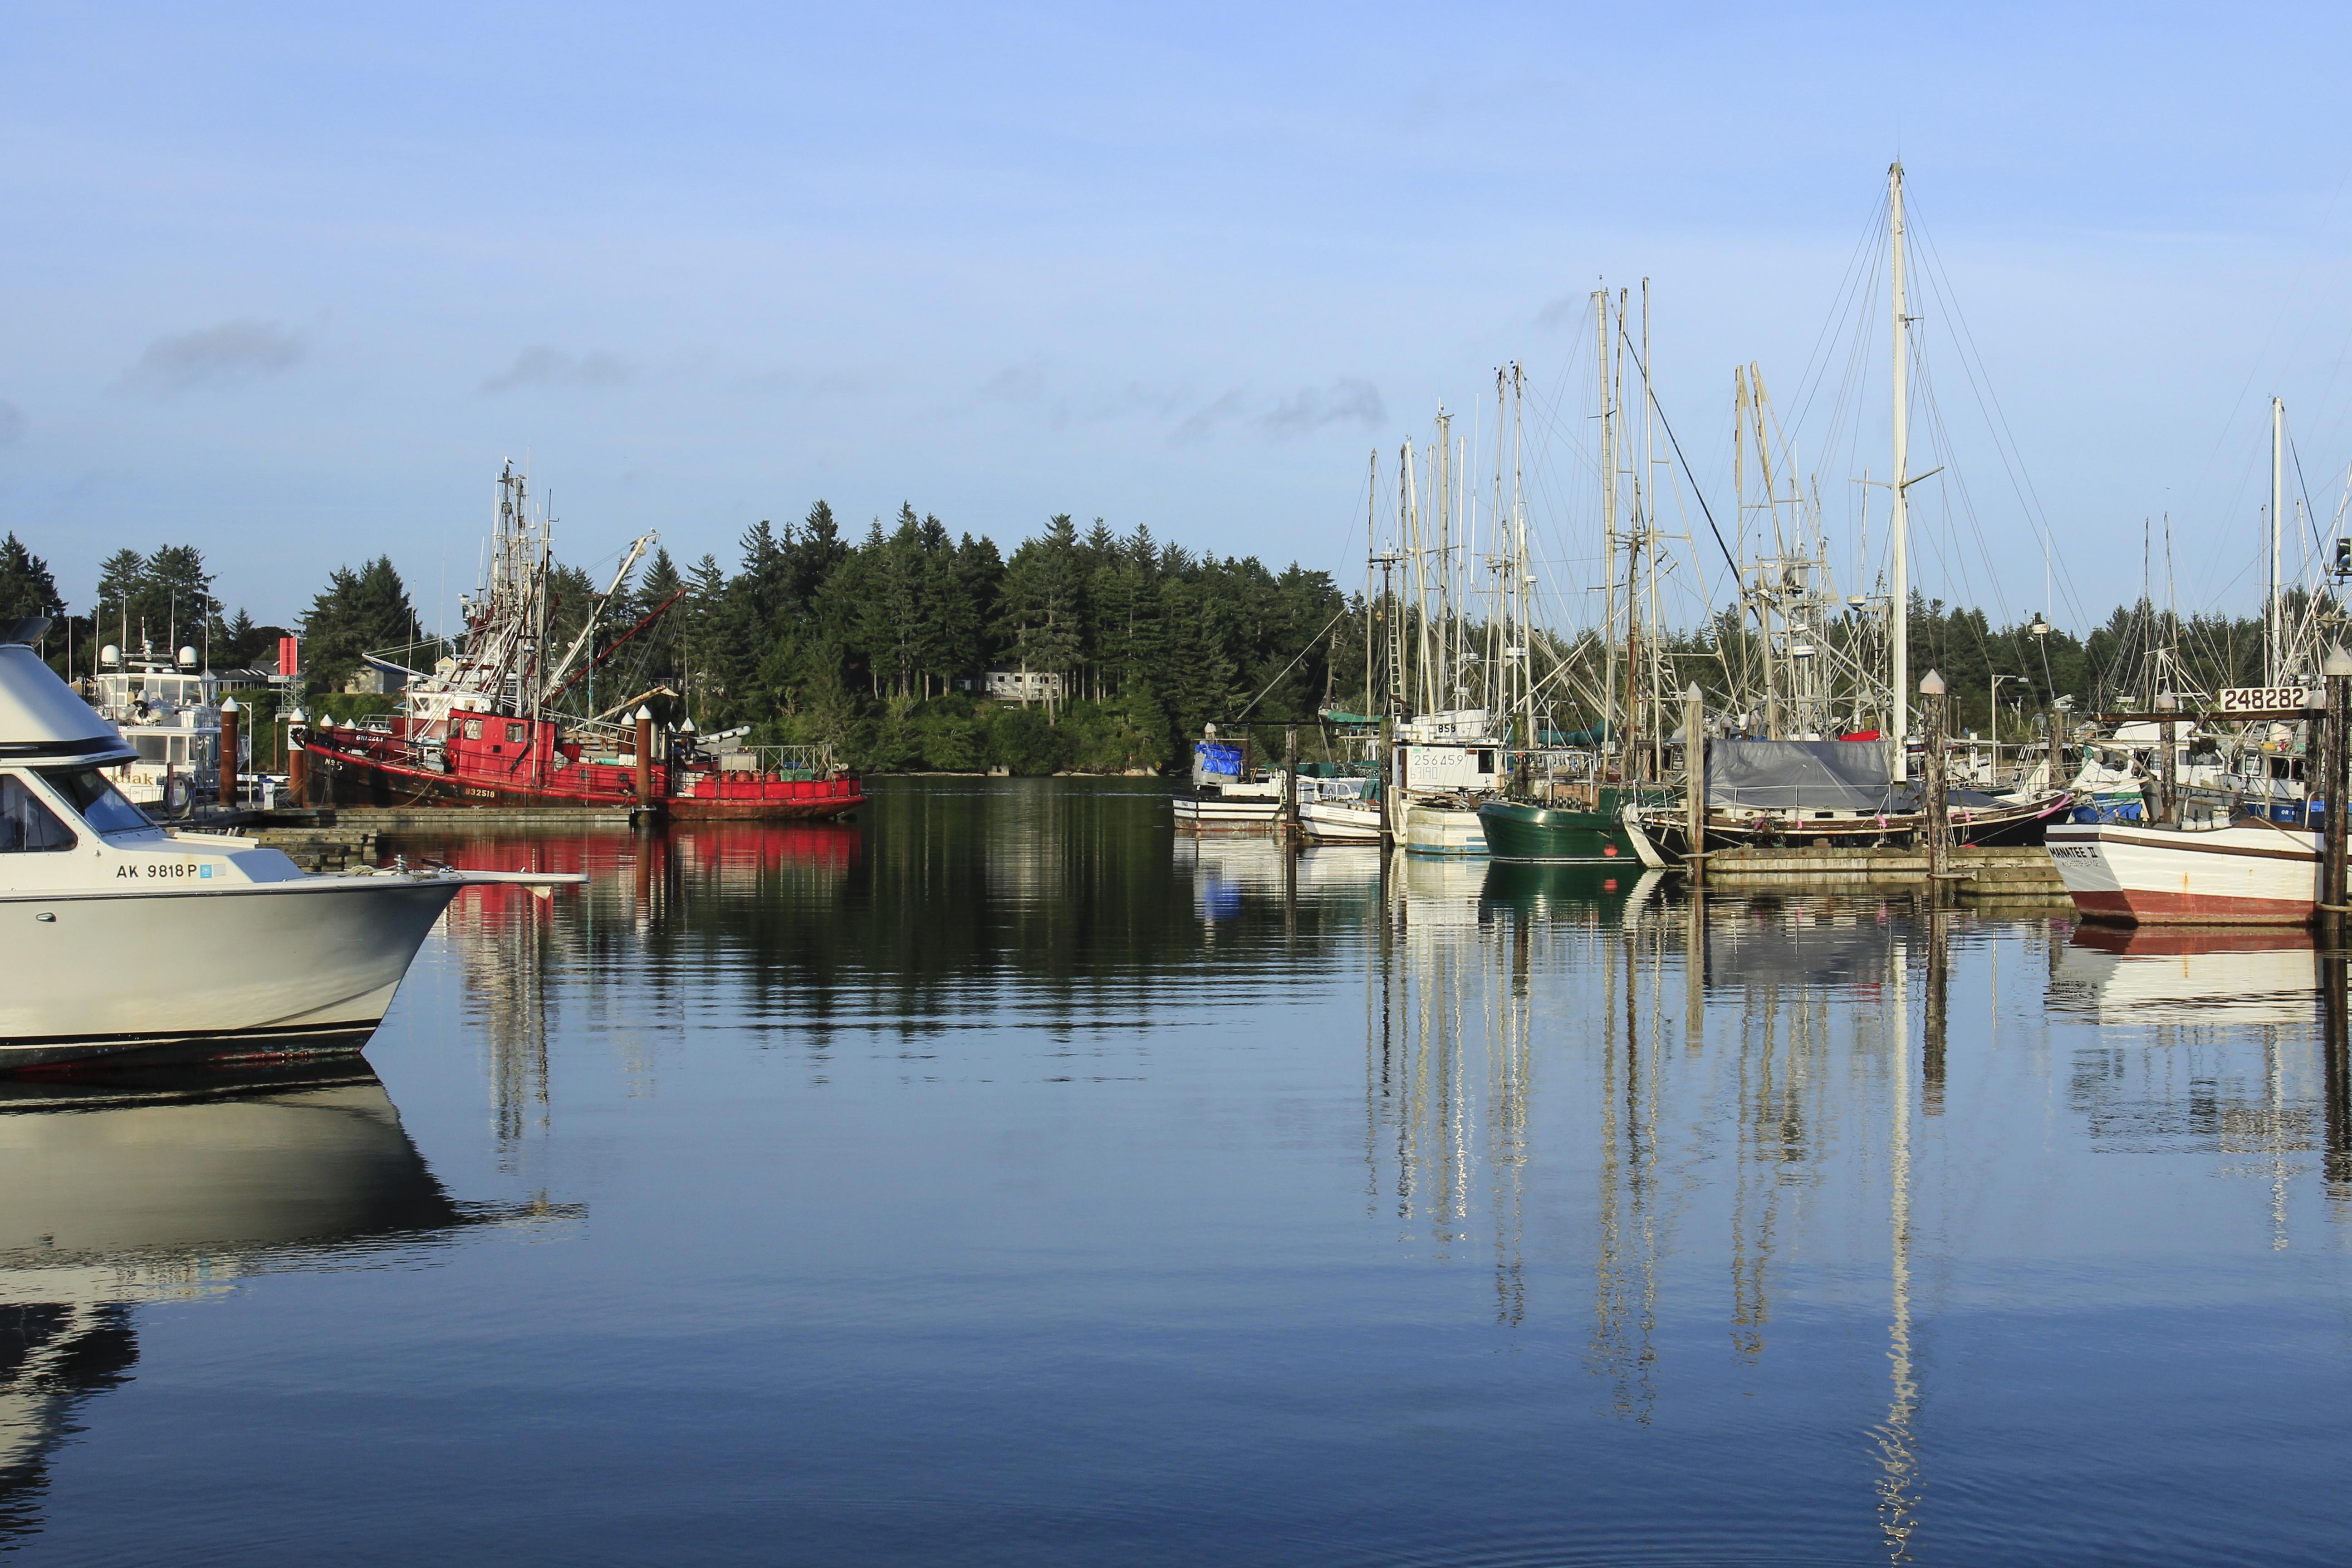 Coos bay, oregon, marina photo